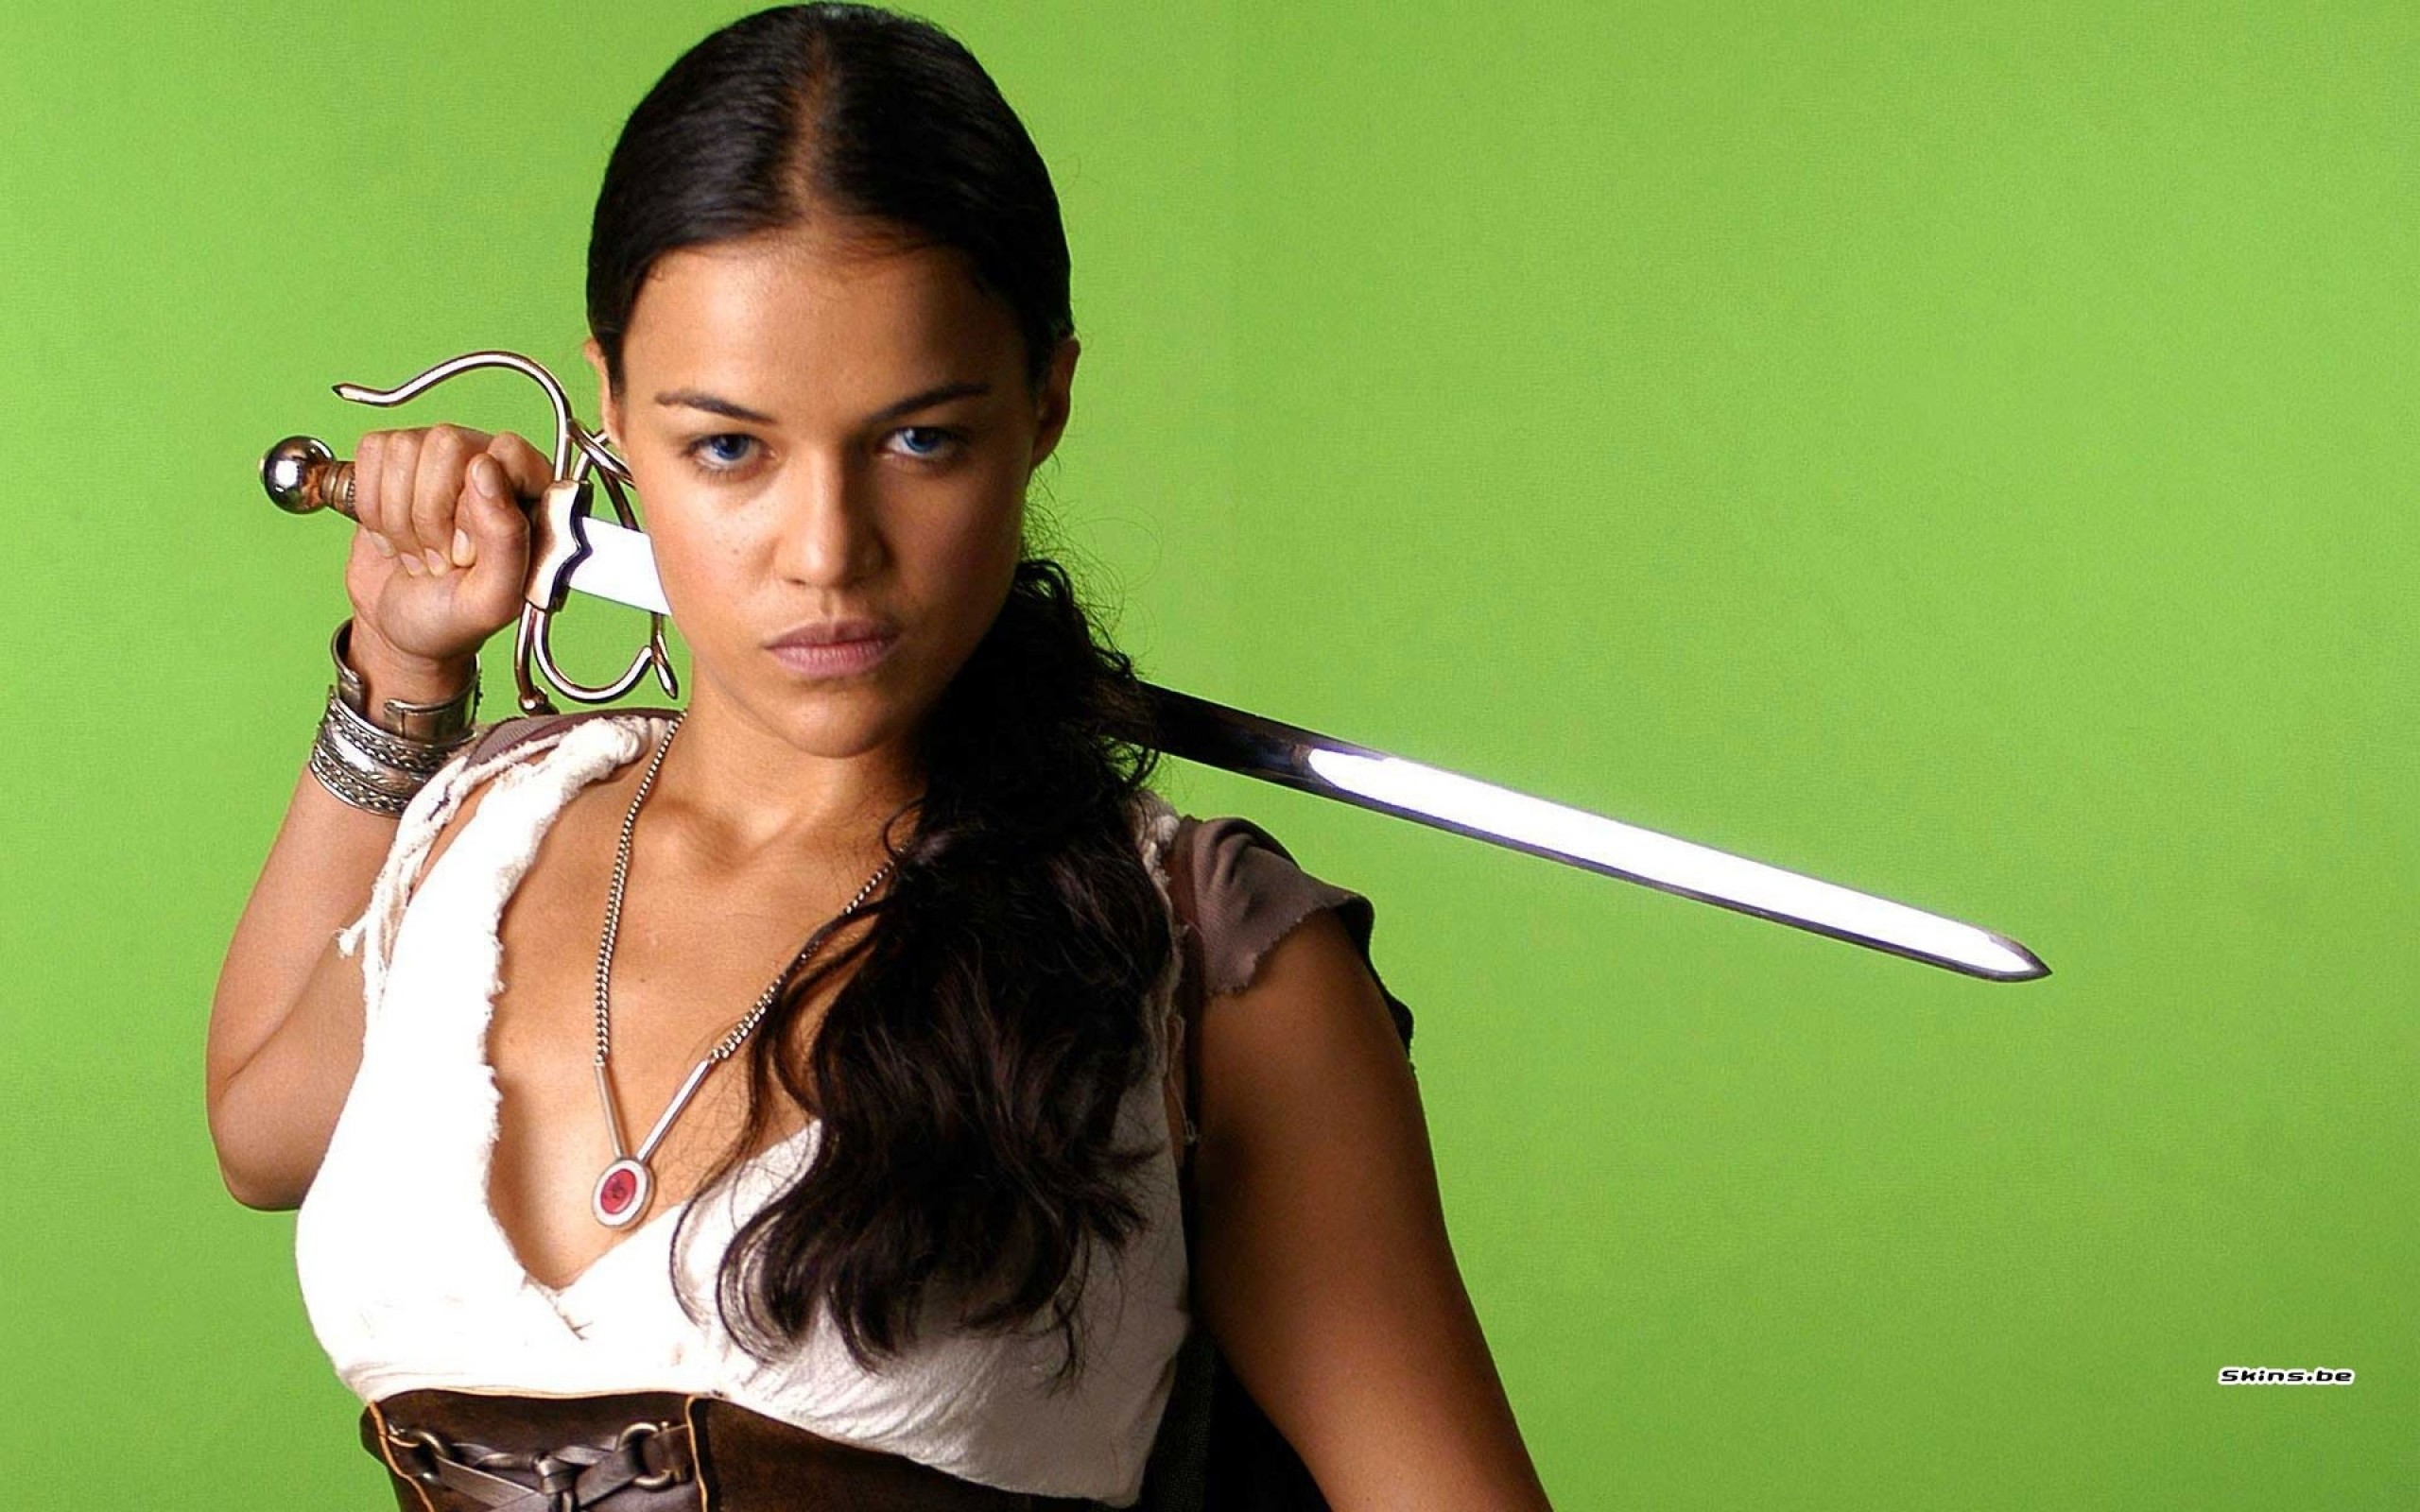 women michelle rodriguez swords 1920×1200 wallpaper Art HD Wallpaper